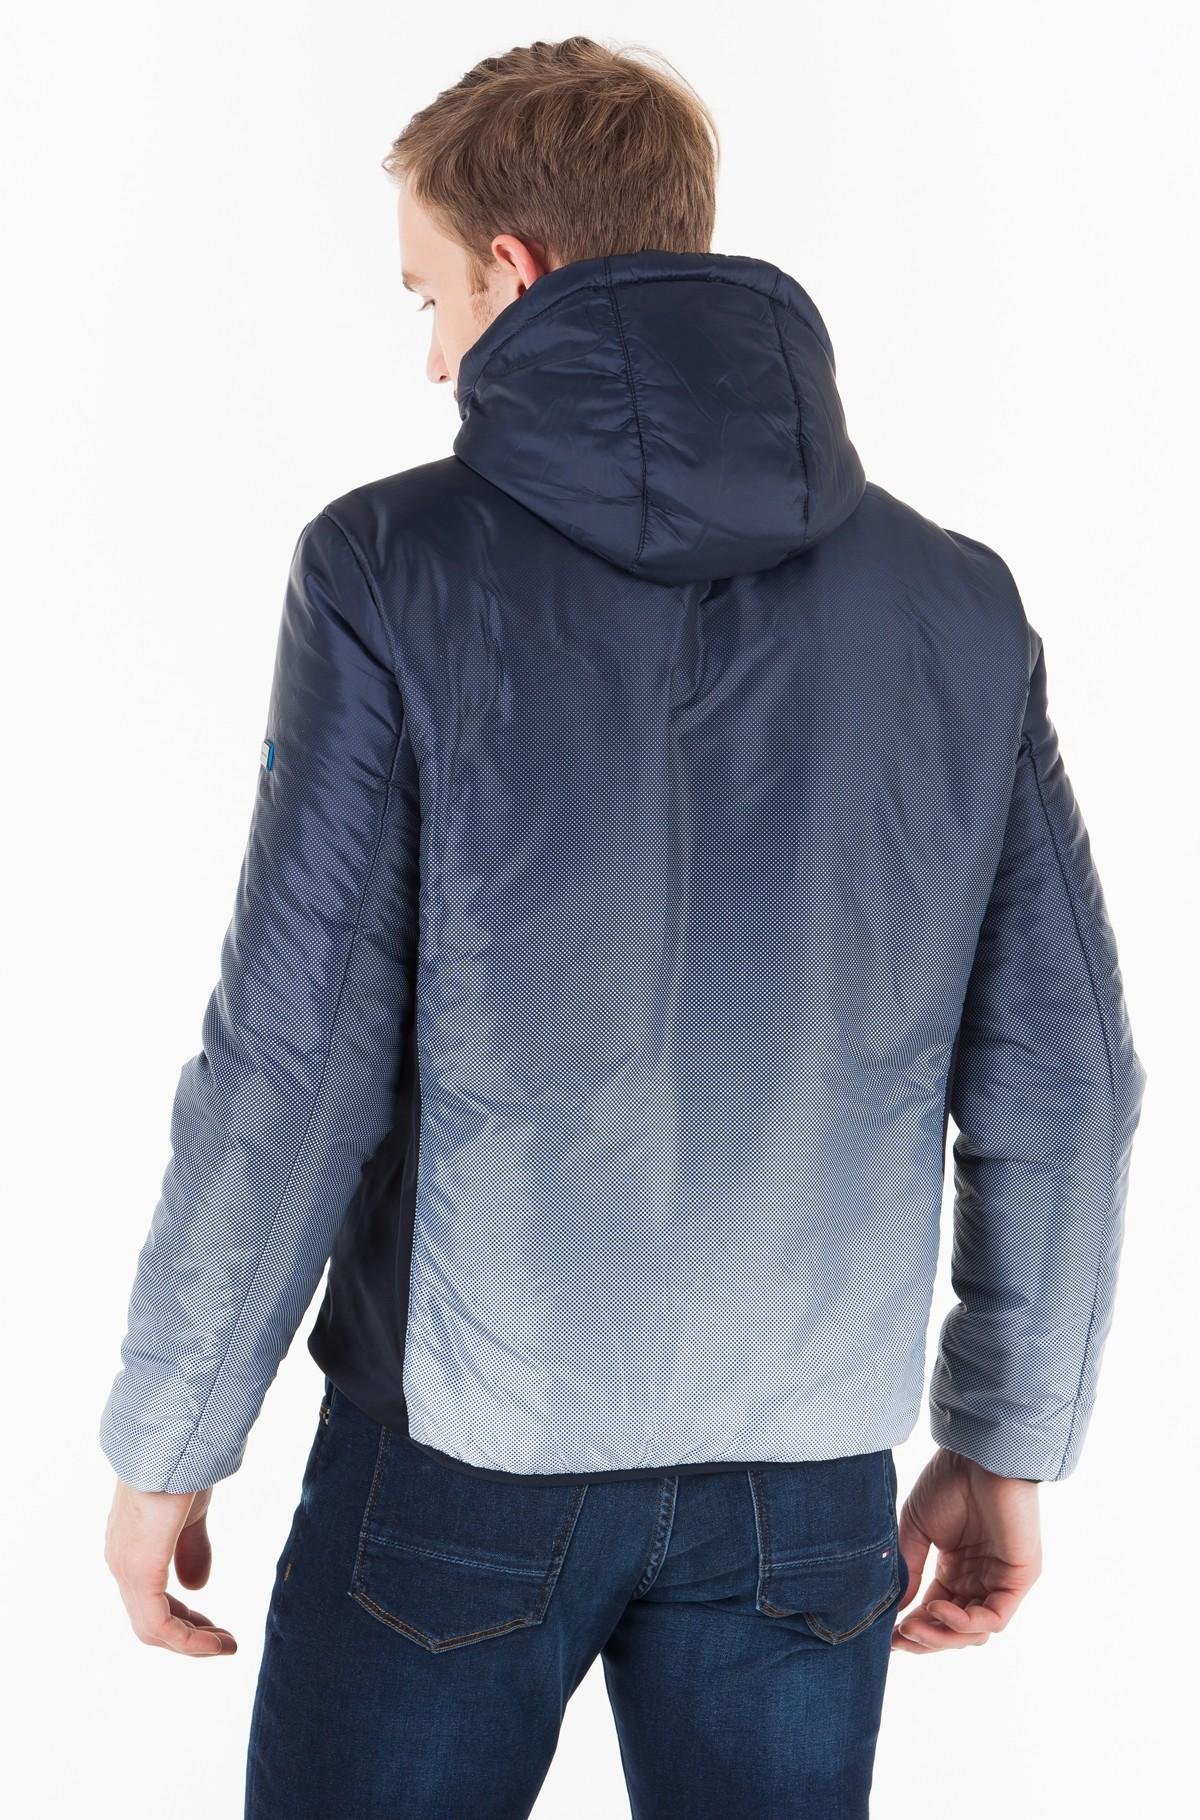 Jacket 67480-3987-full-2